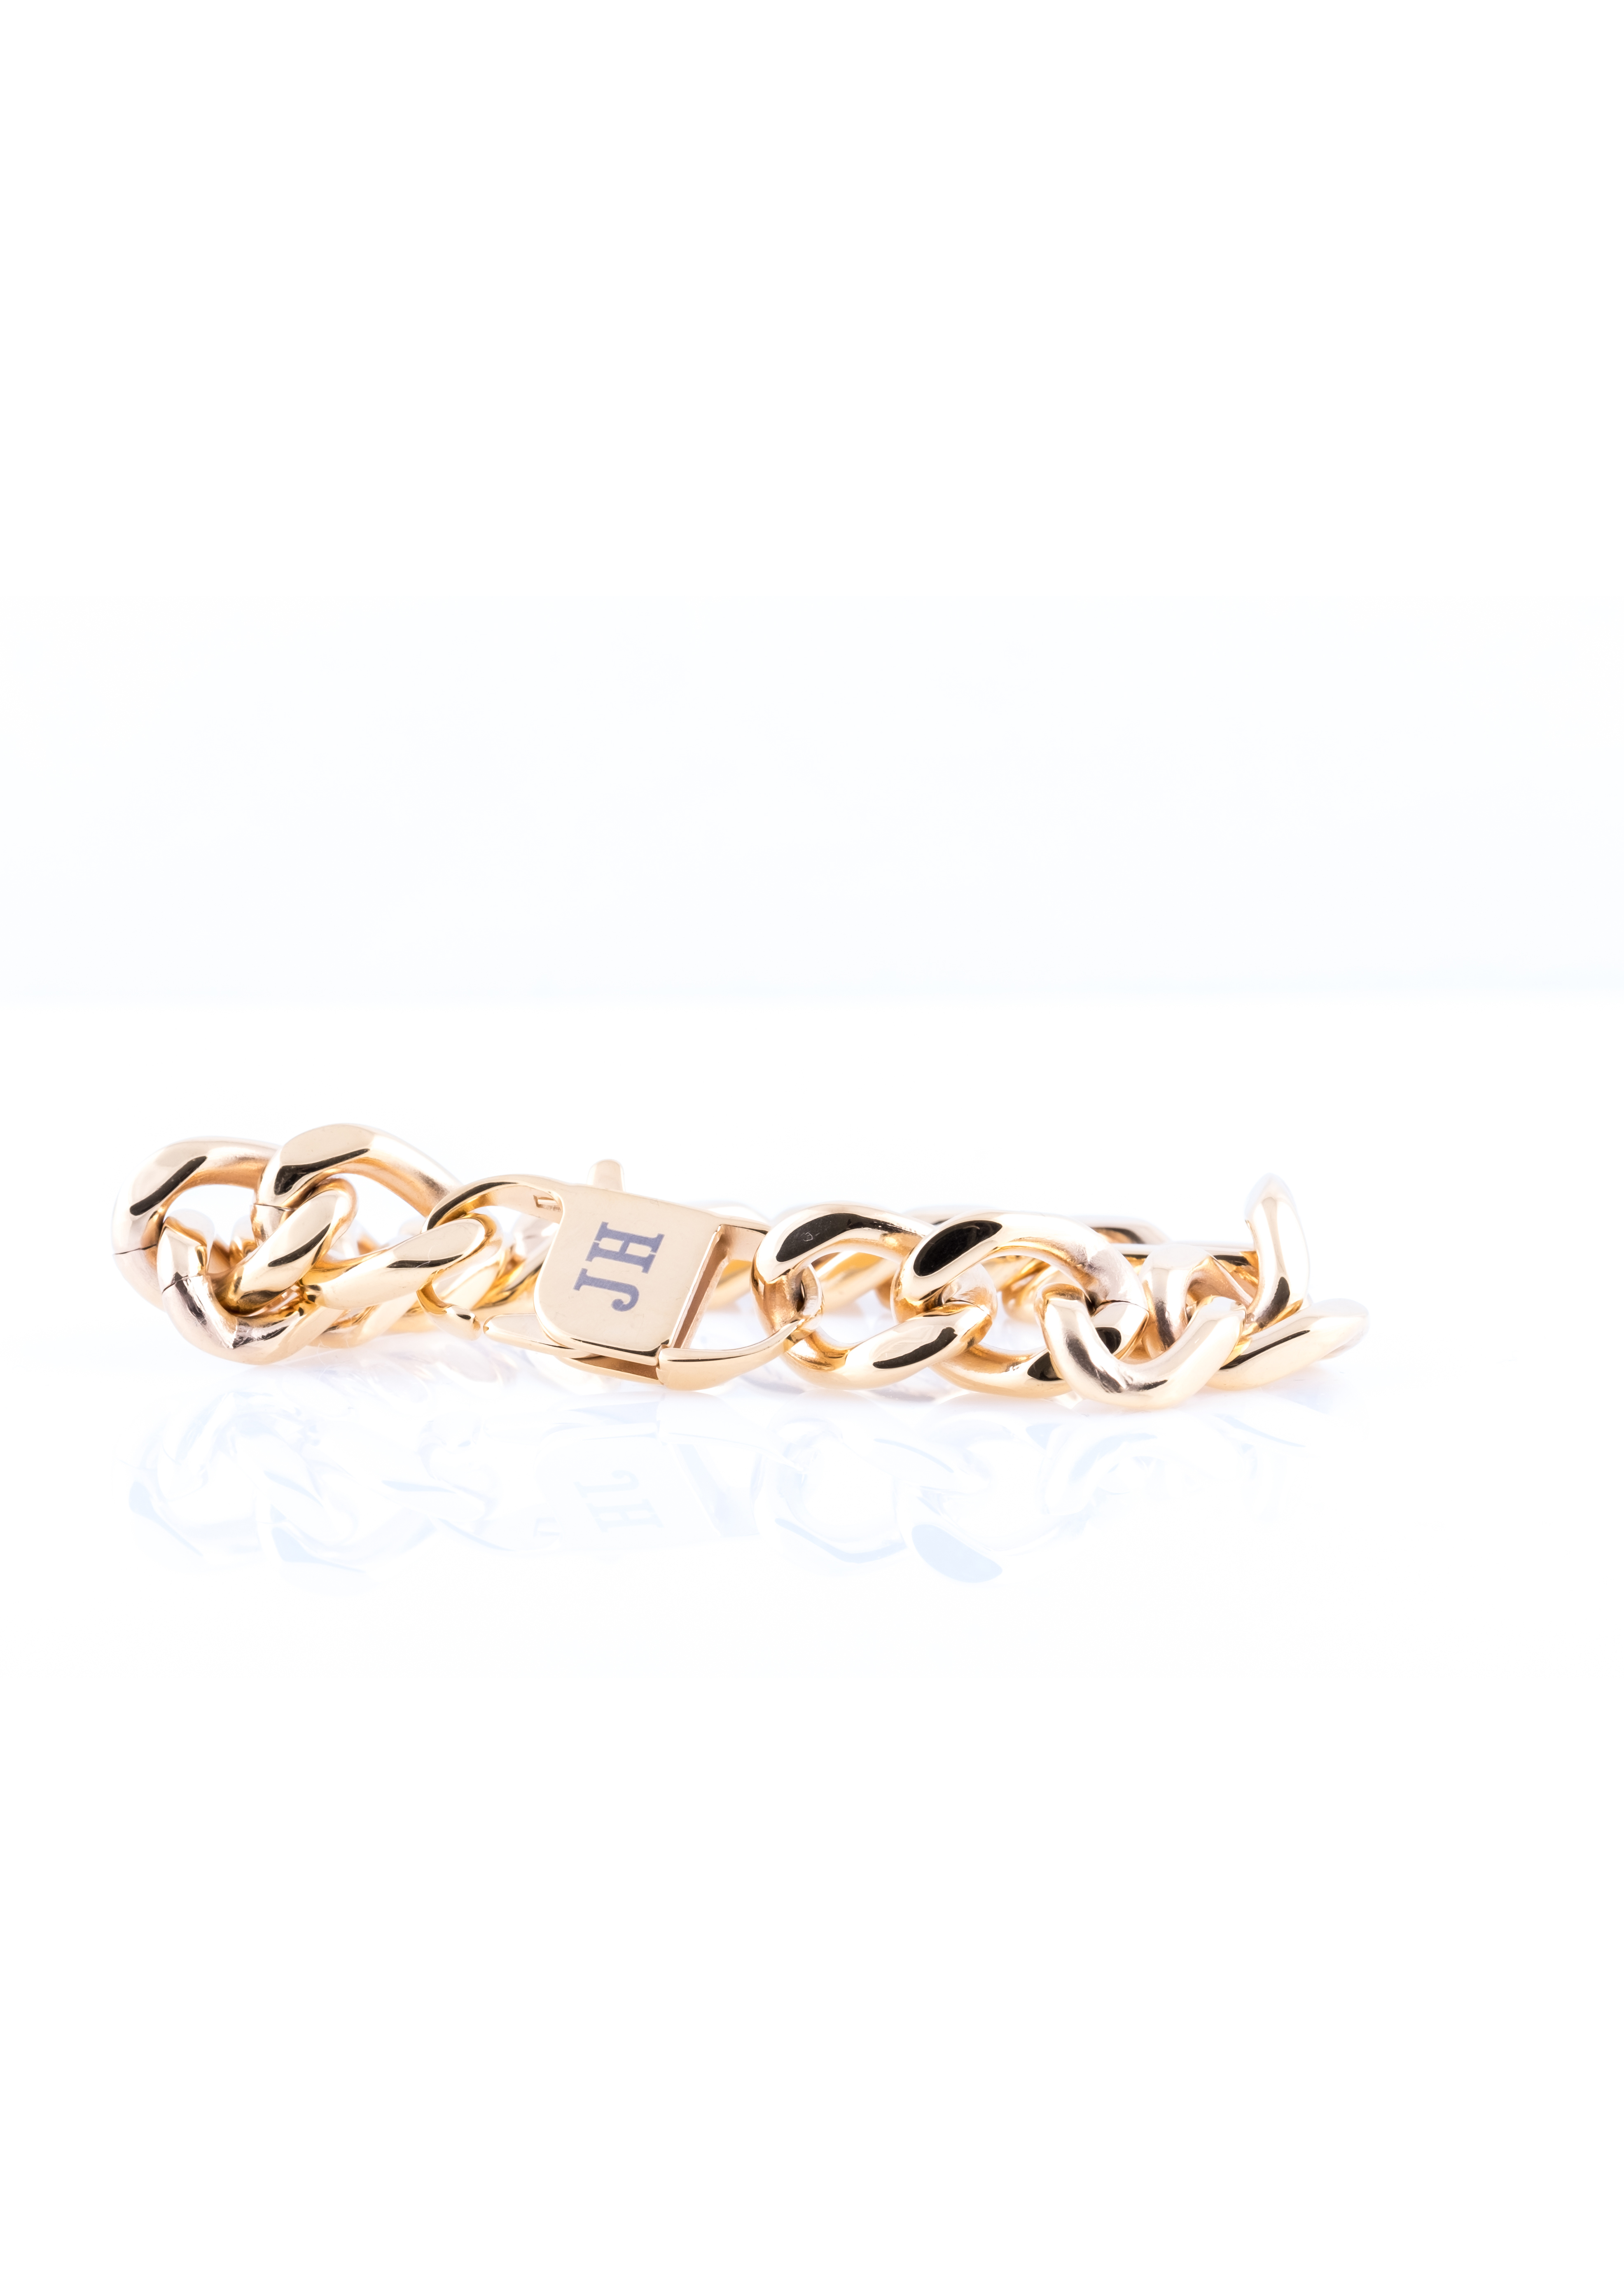 Bracelet Sonny Gold